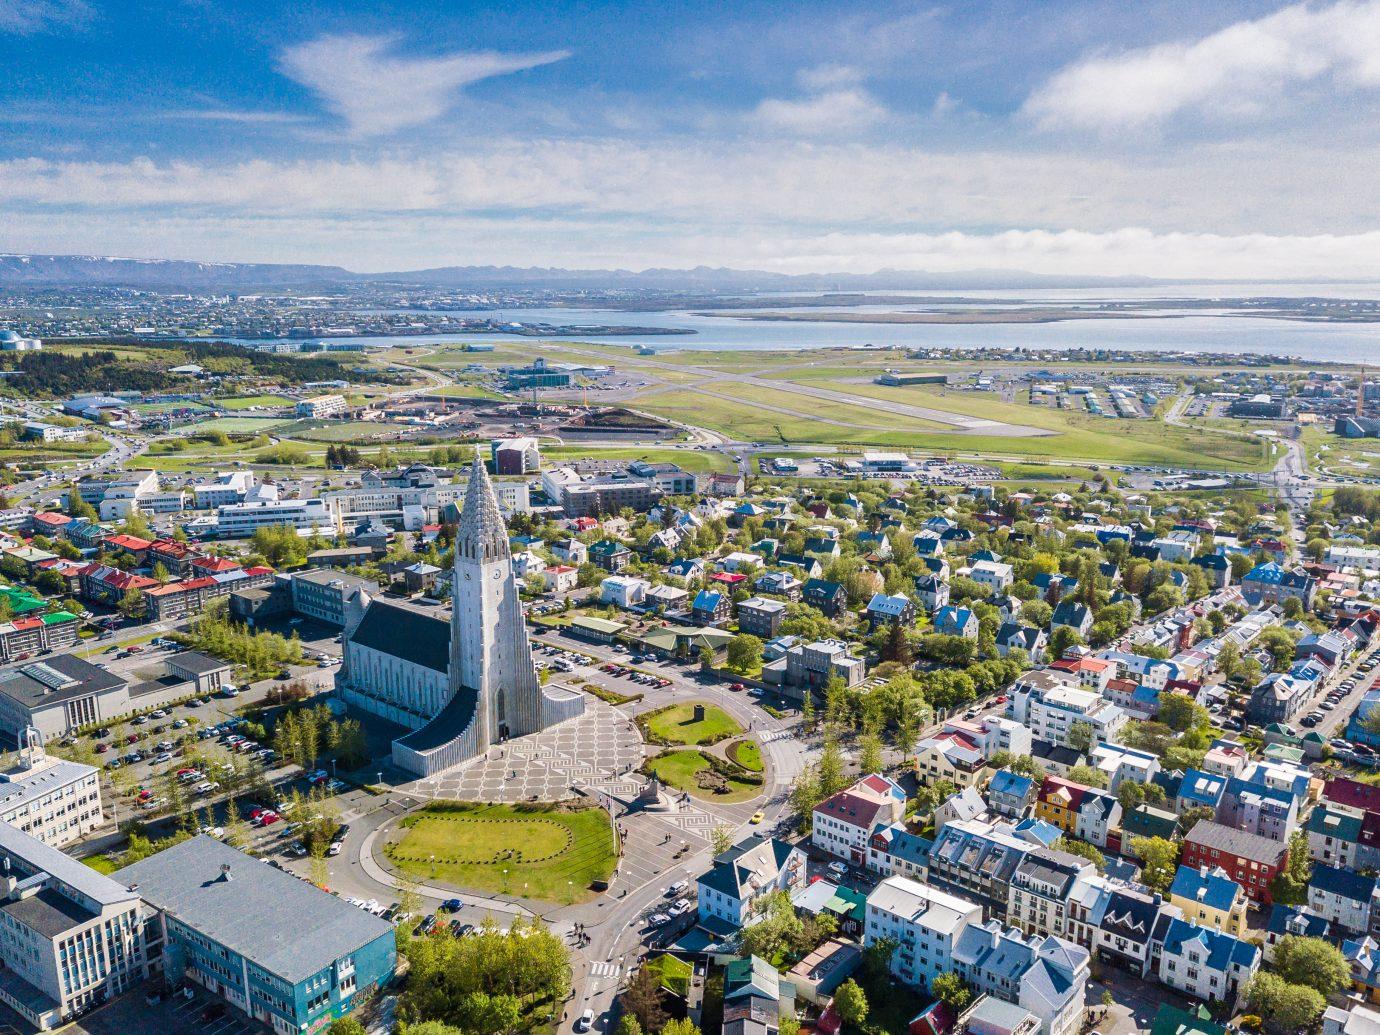 Reykjavik Iceland city scape frop the top with Hallgrimskirkja church.